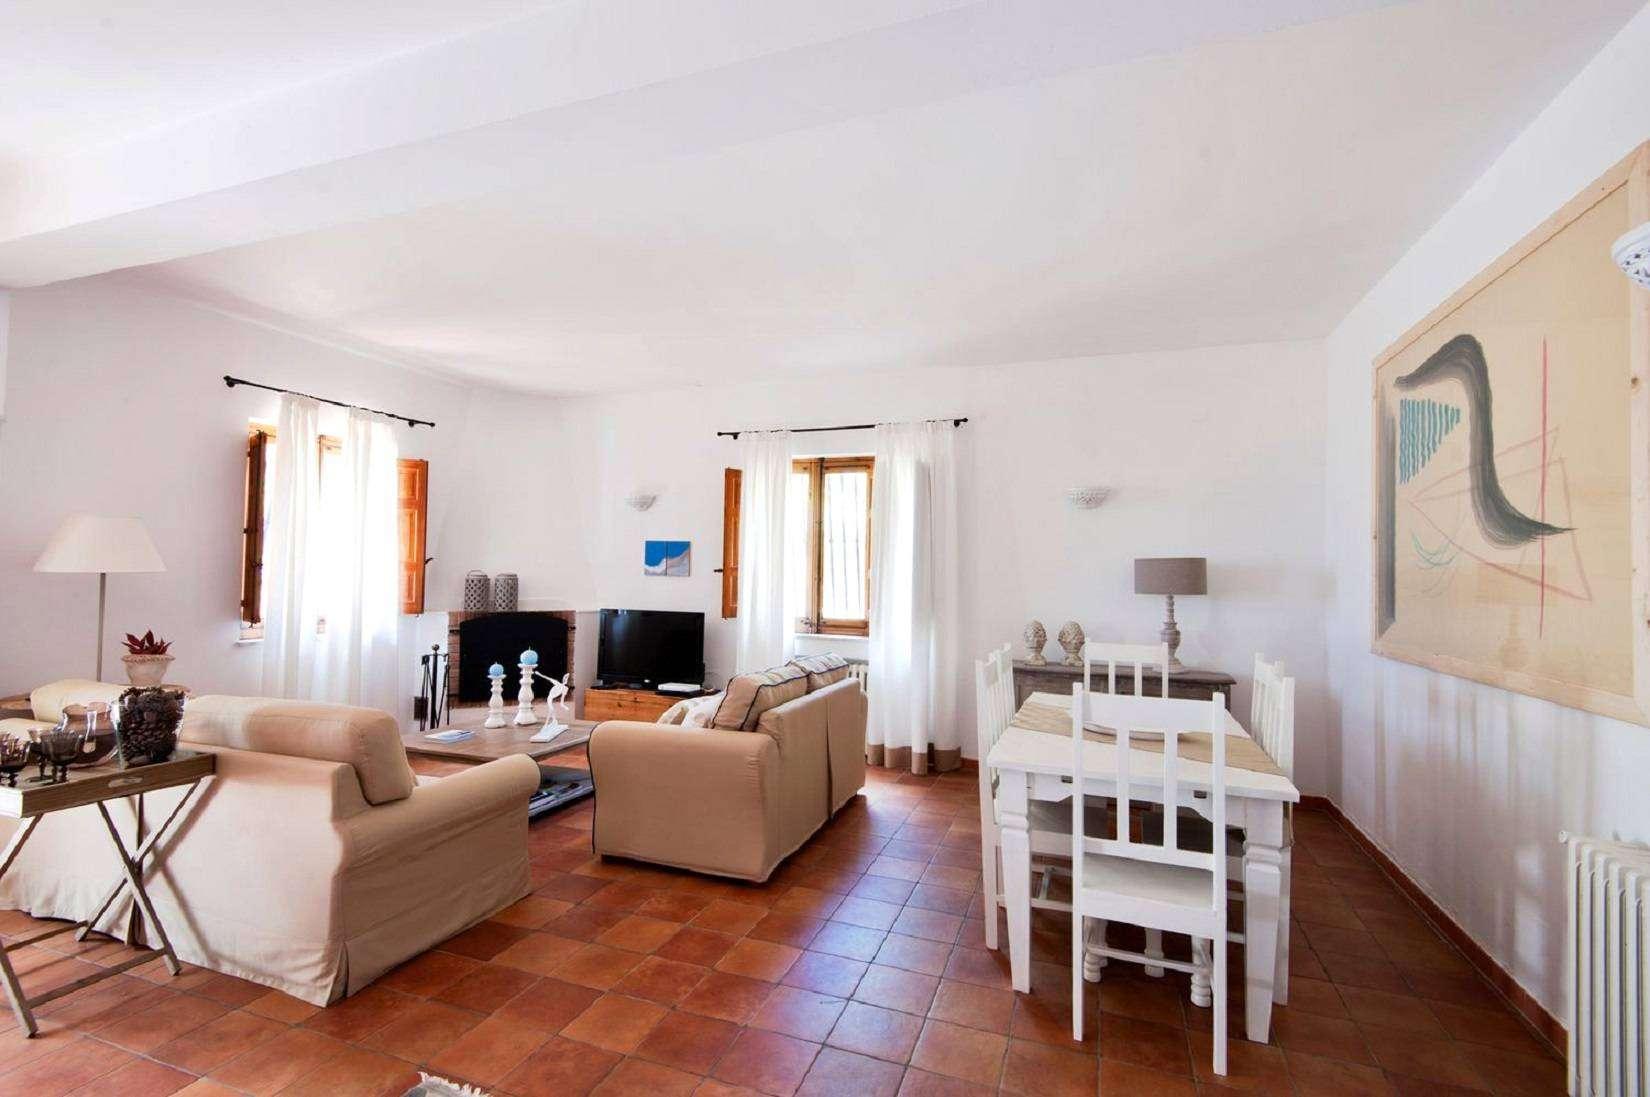 3 La Rocca Living room